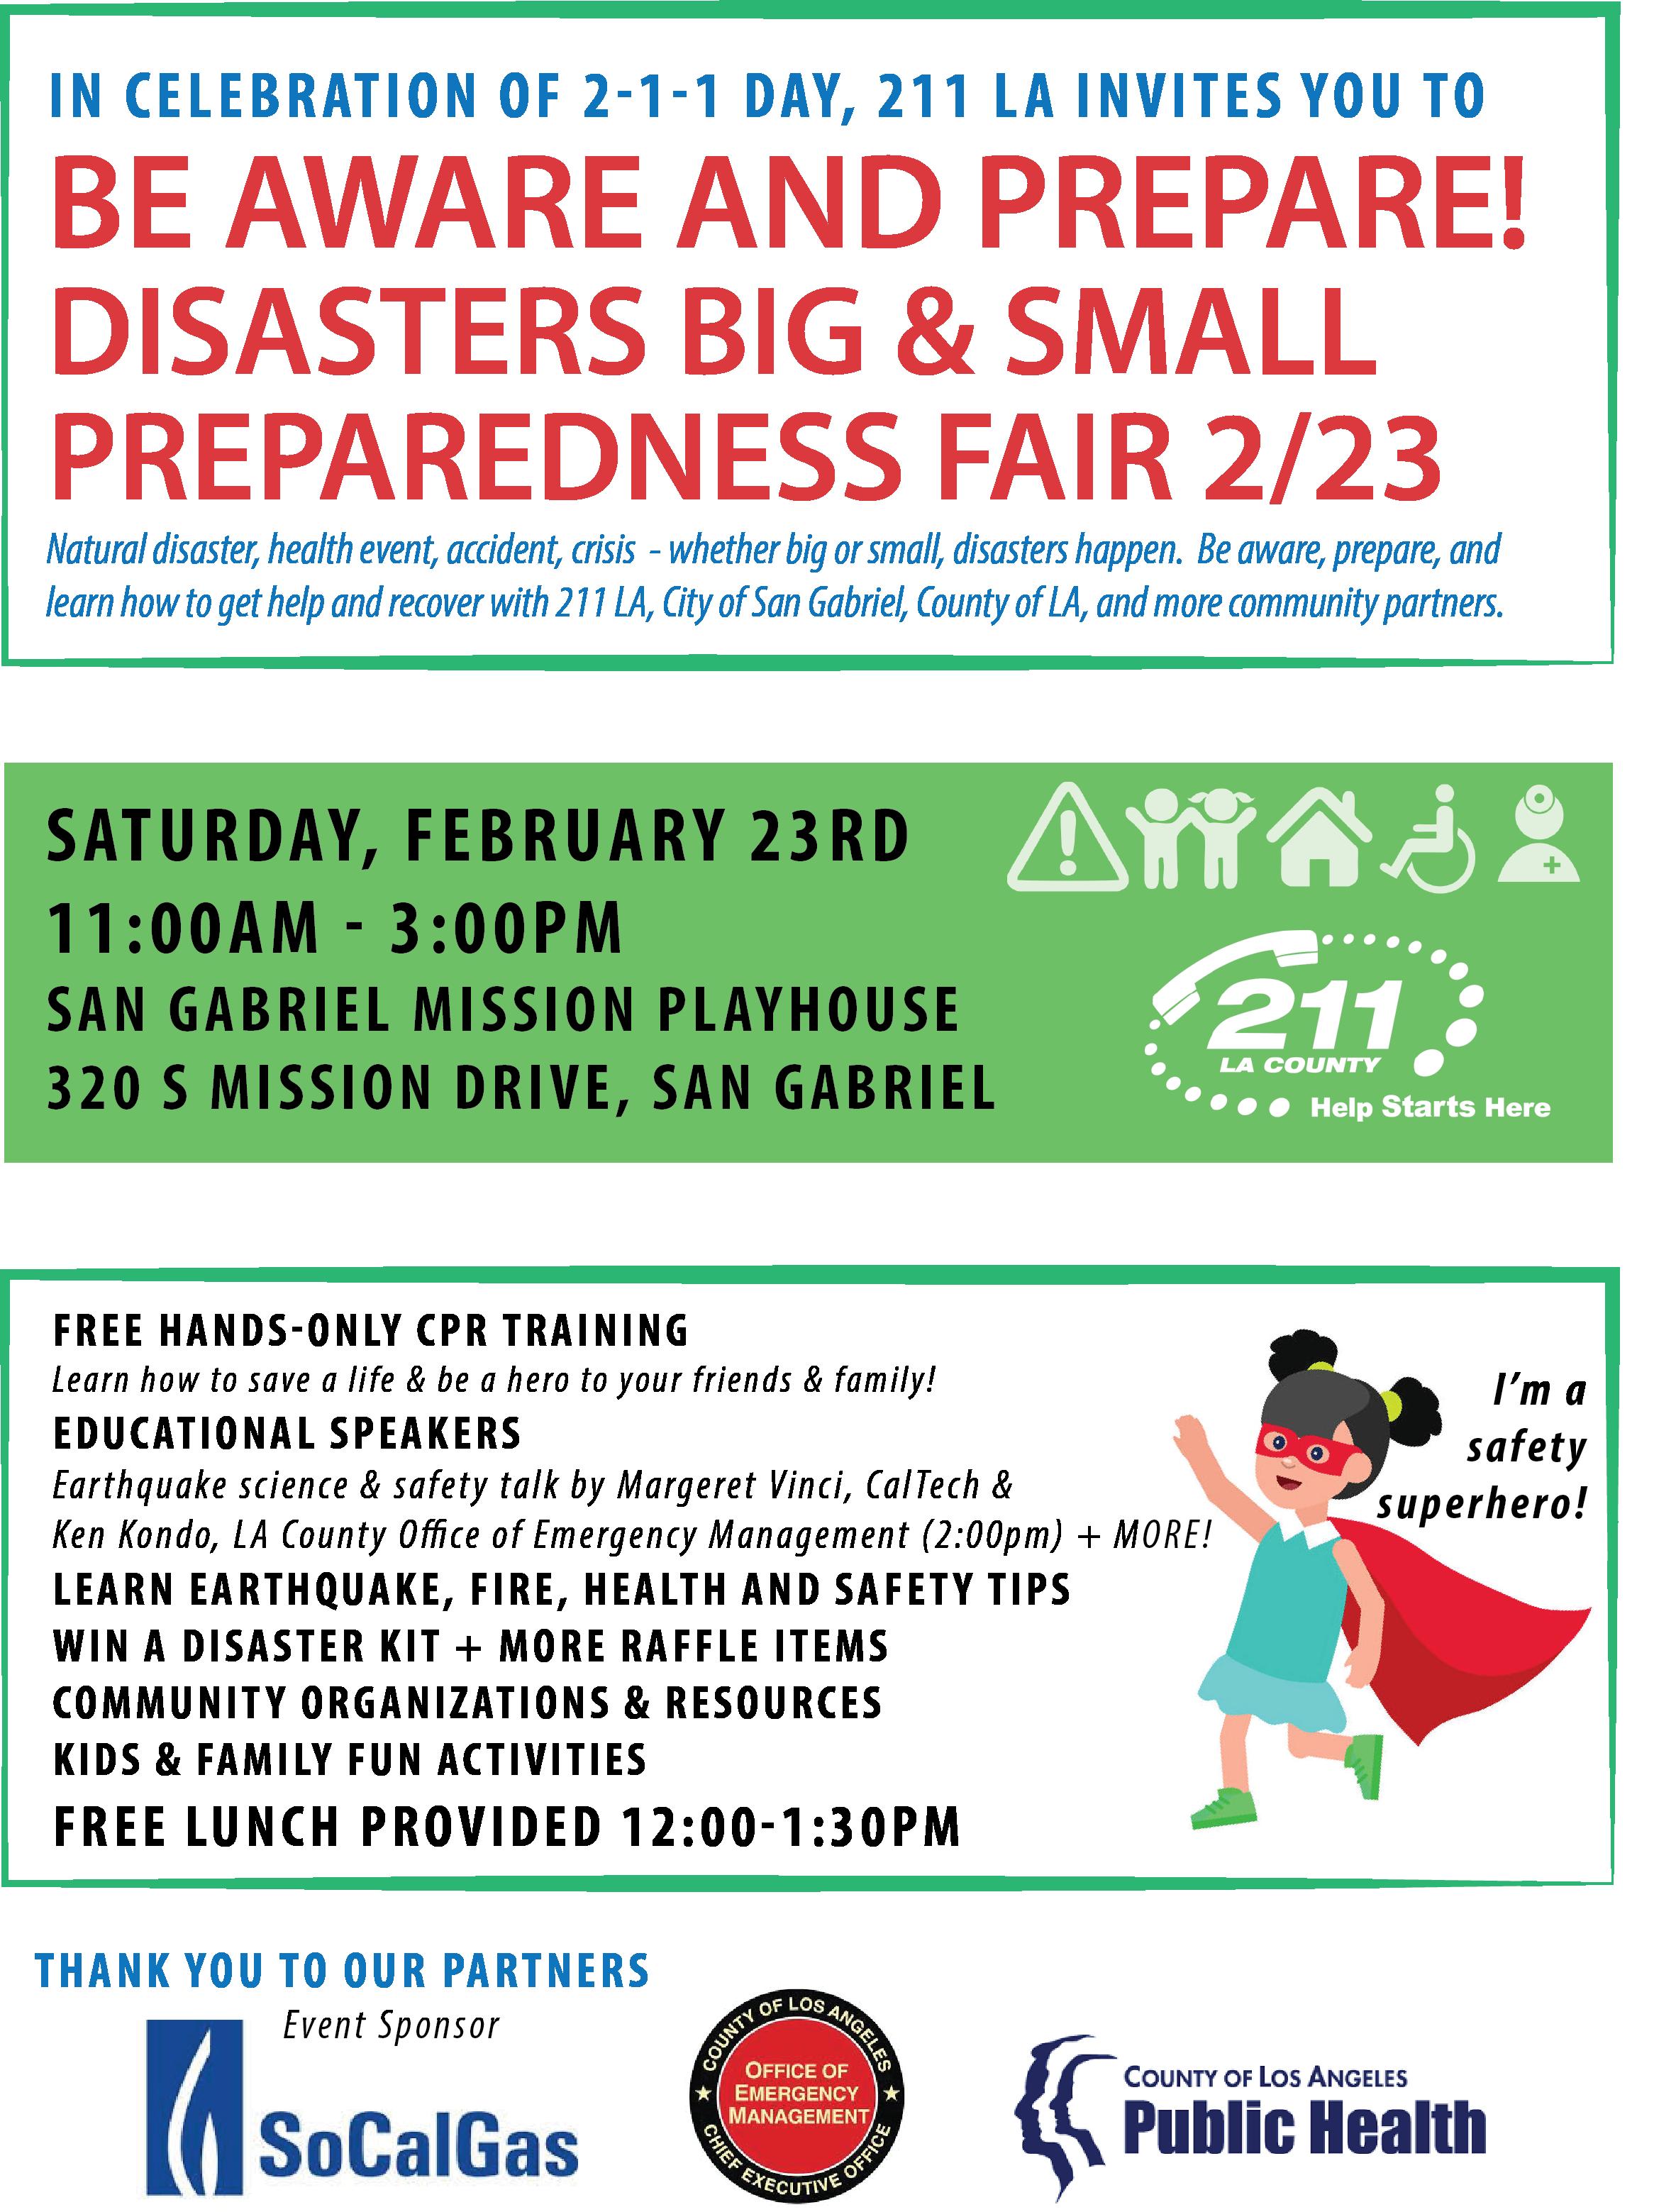 Flyer for February 23rd Prepareathon event